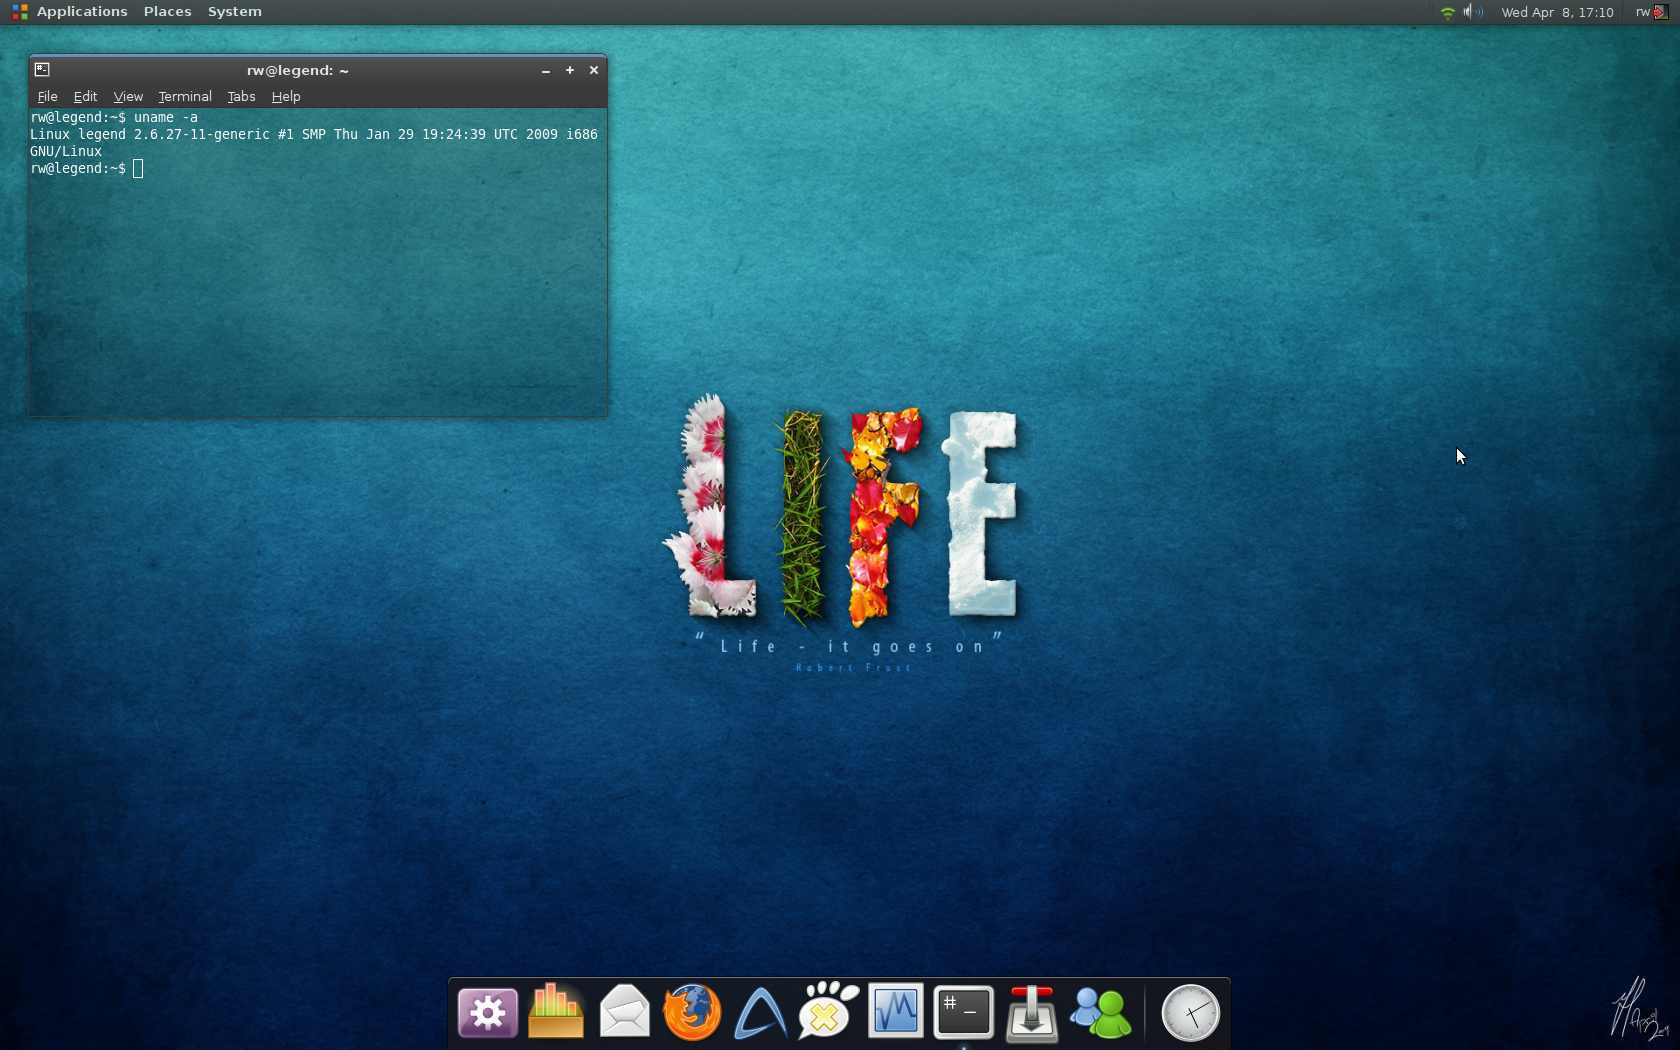 April 2009 Desktop Screenshot Thread [Archive] - Page 2